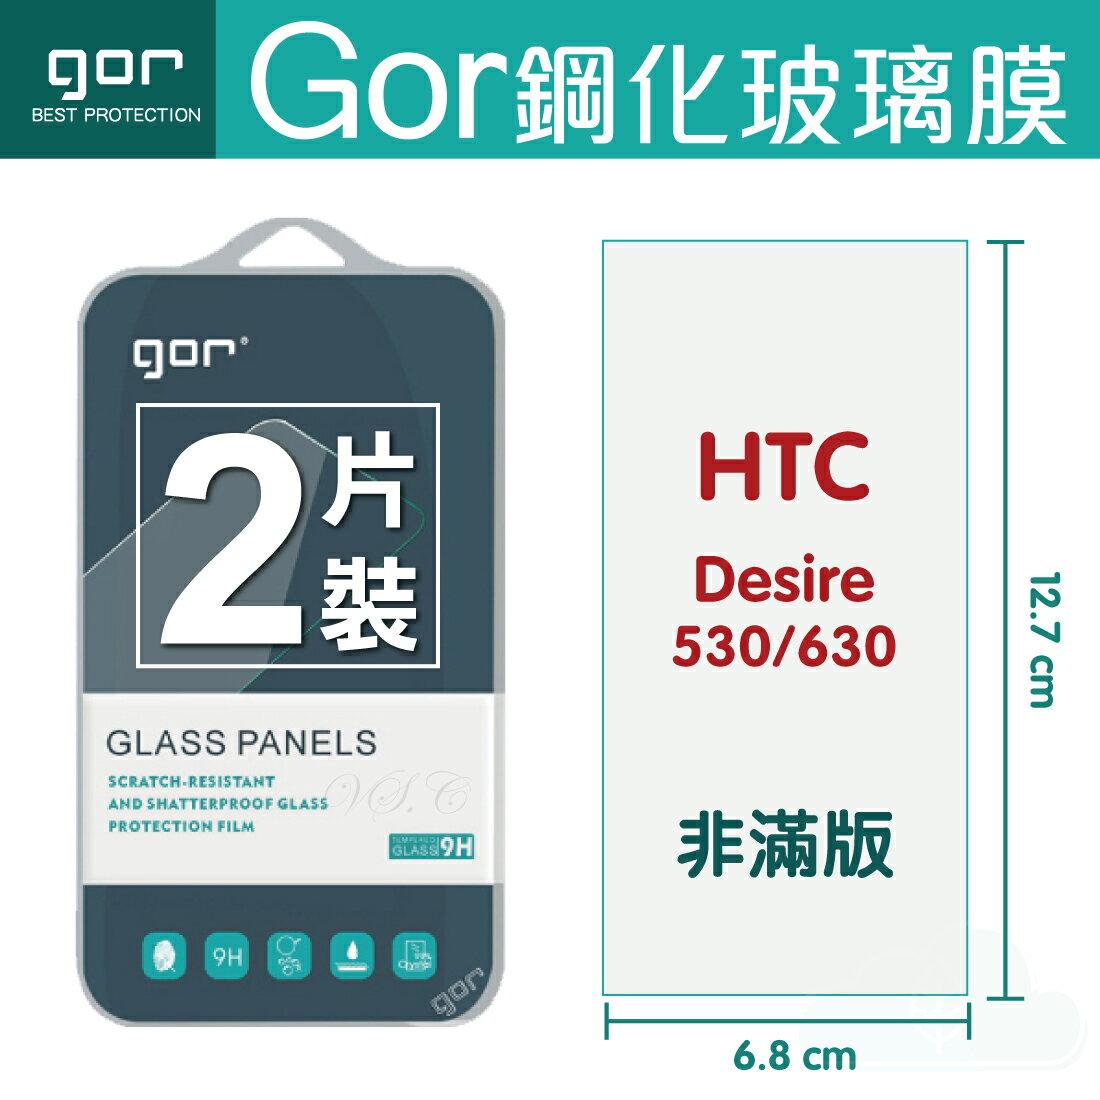 【HTC】GOR 9H HTC Desire 530 / 630 鋼化 玻璃 保護貼 全透明非滿版 兩片裝 【全館滿299免運費】